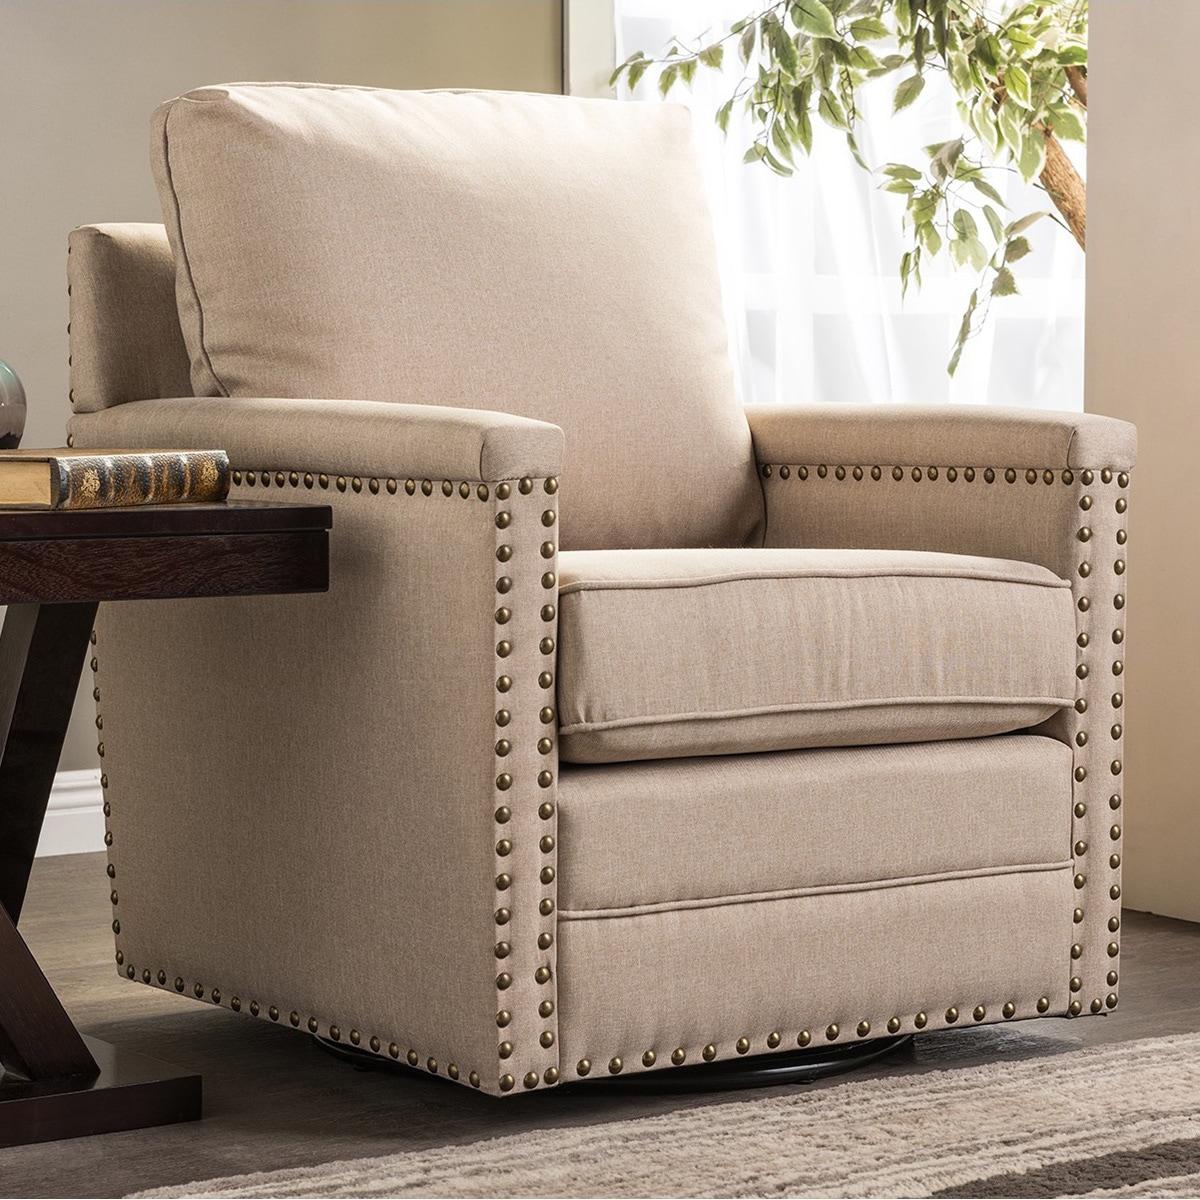 Baxton Studio Ashley Contemporary Beige Fabric Upholstere...